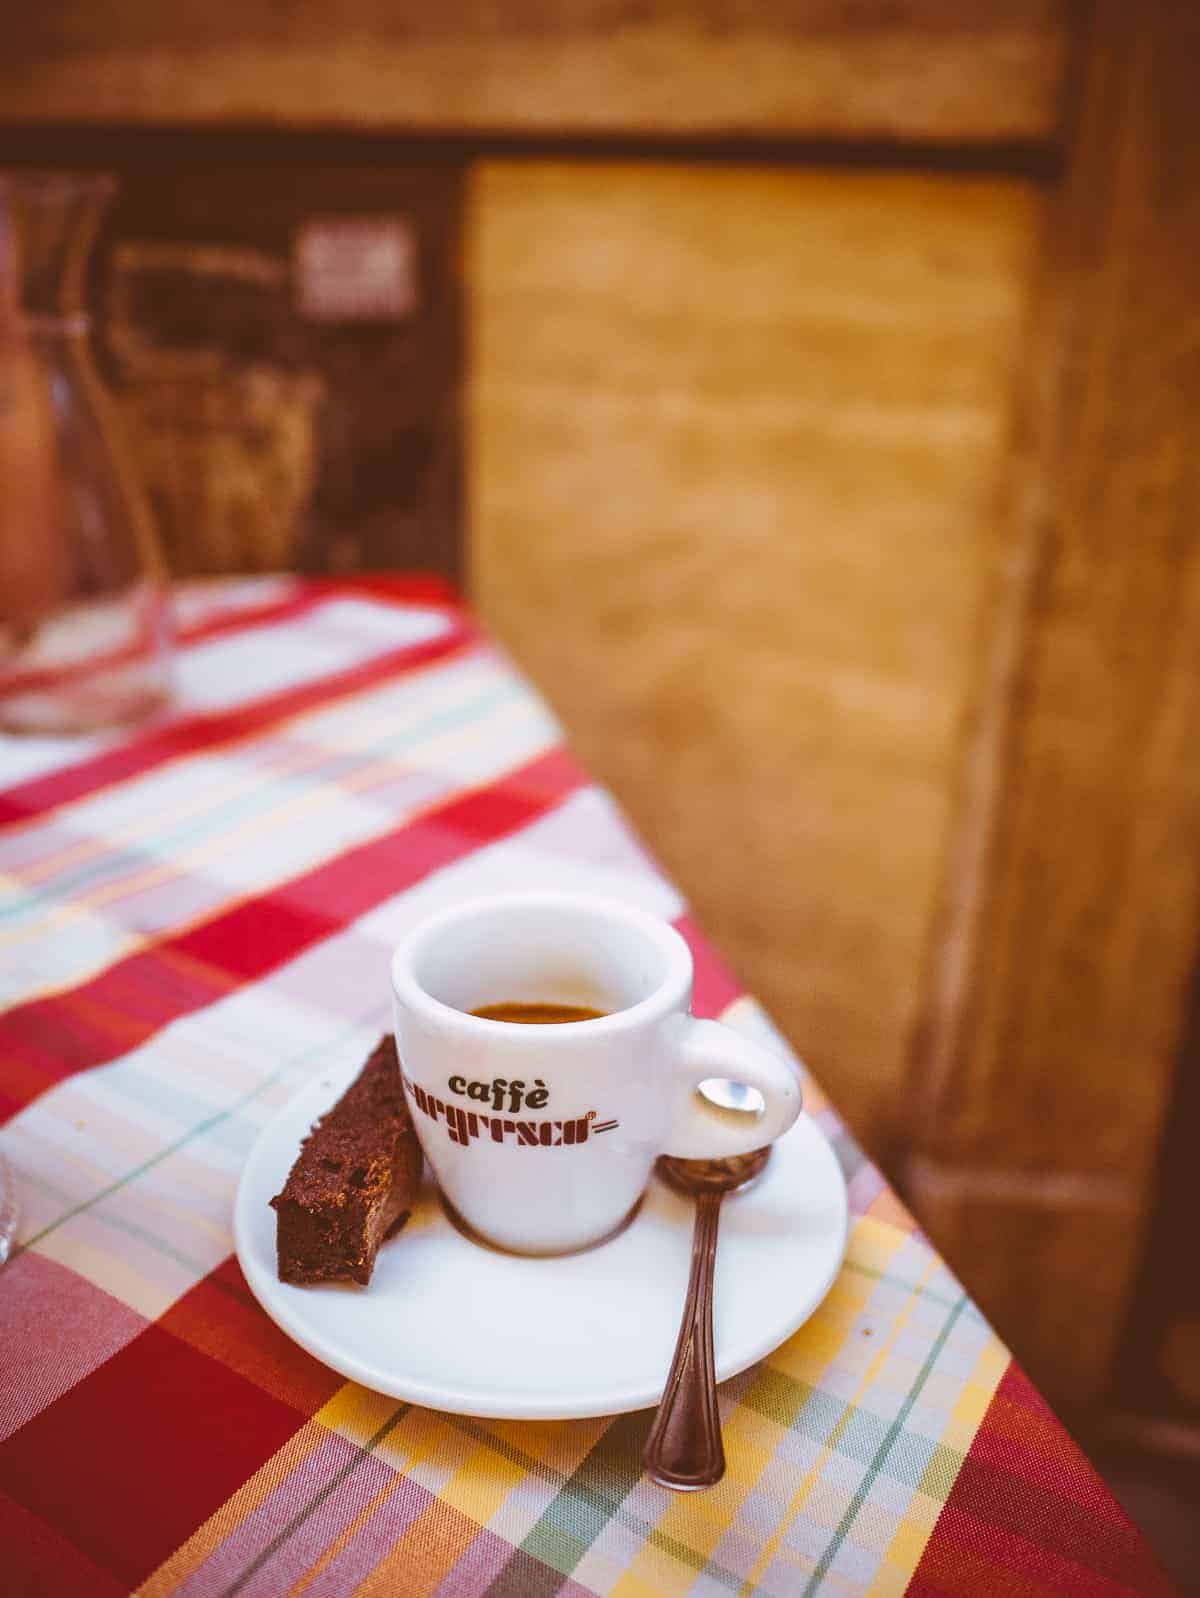 espresso coffee served in espresso cup on multicoloured tablecloth in Rome, Italy